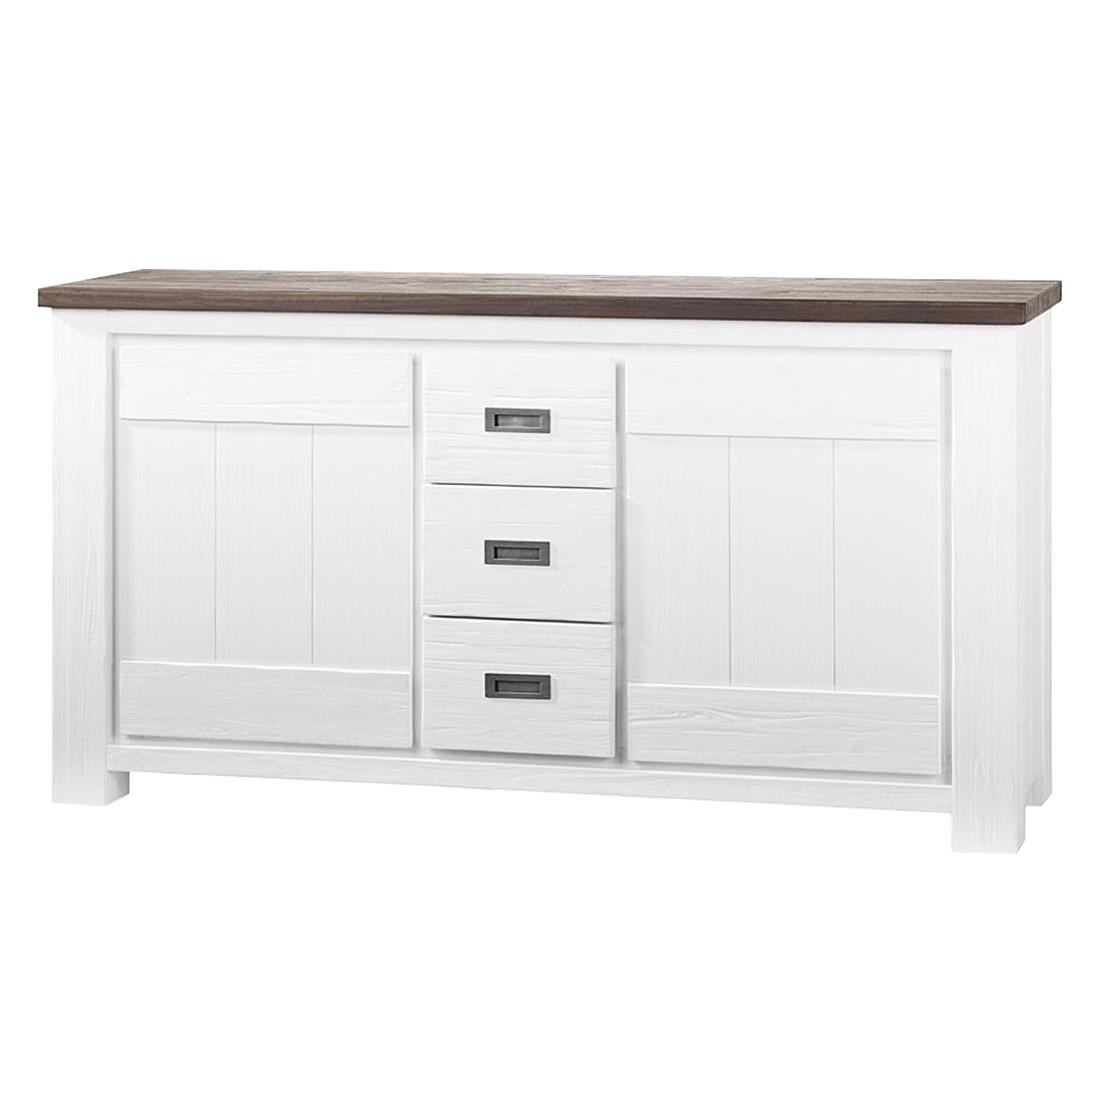 Sideboard Deaumain - Akazie teilmassiv - Weiß - Maße: 220 x 85 cm, Habufa